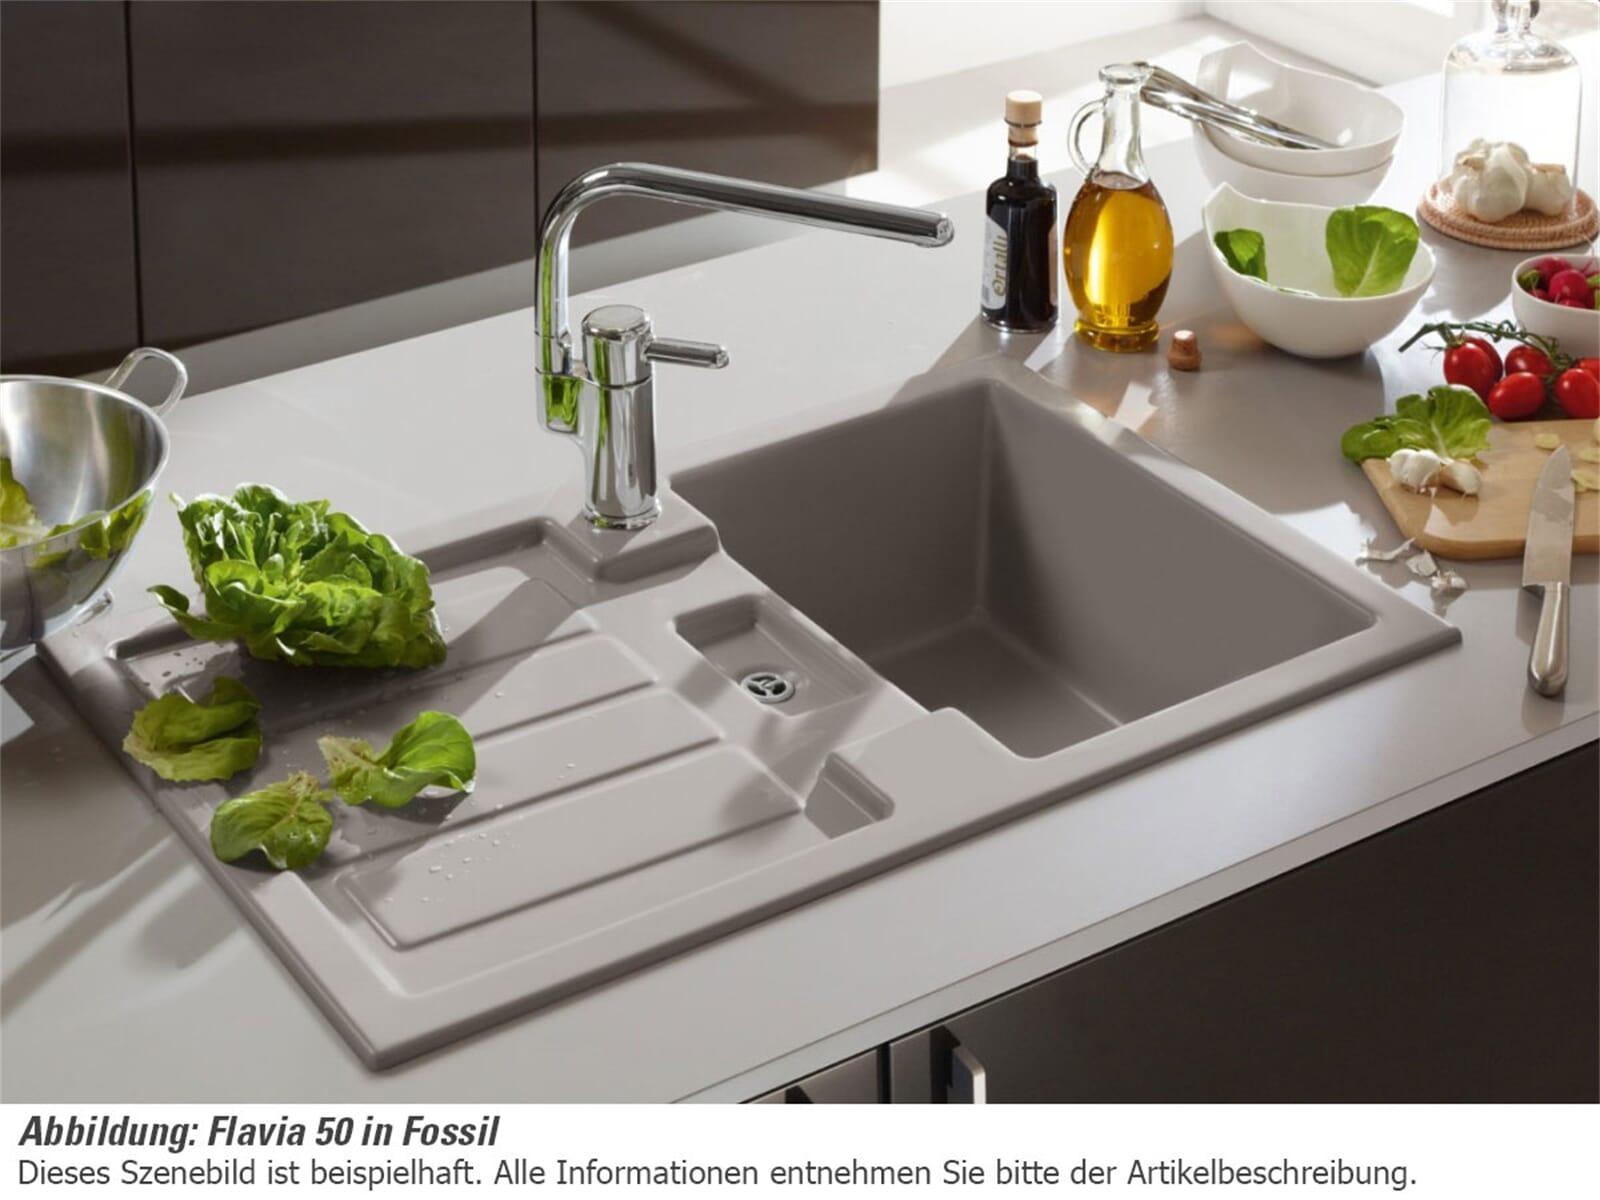 Villeroy & Boch Flavia 50 Snow White - 3305 01 KG Keramikspüle Handbetätigung